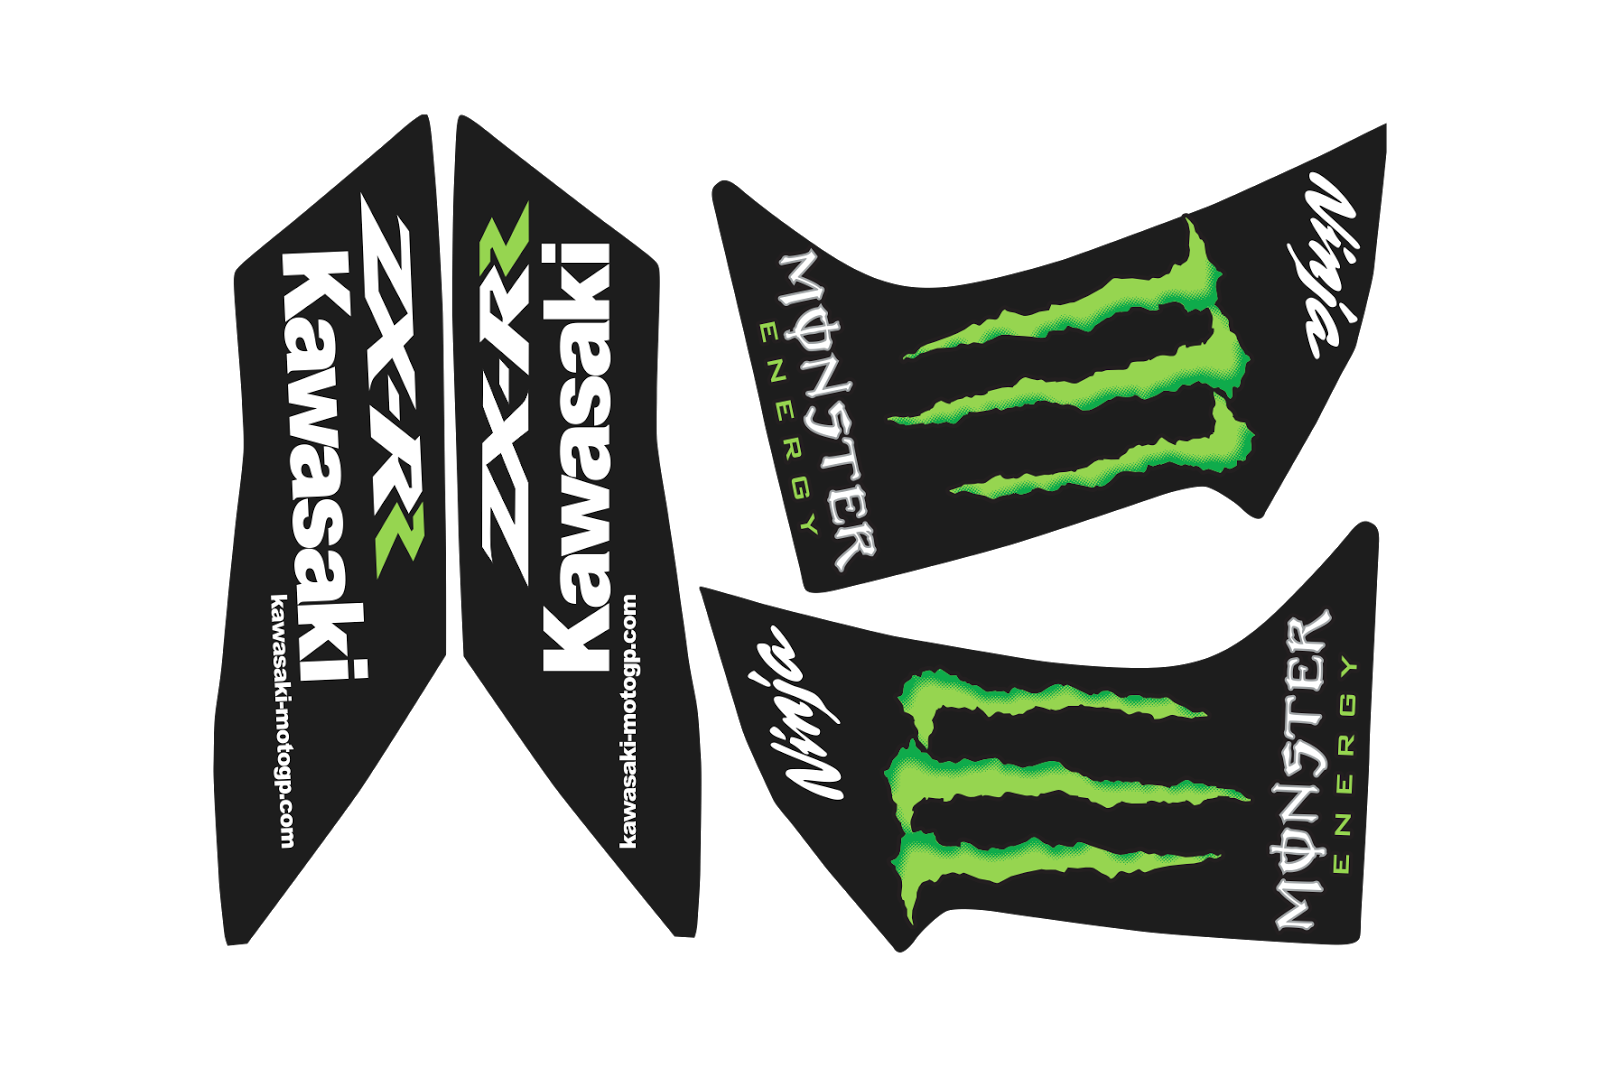 Kawasaki Ninja Monster ZX-RR Vector